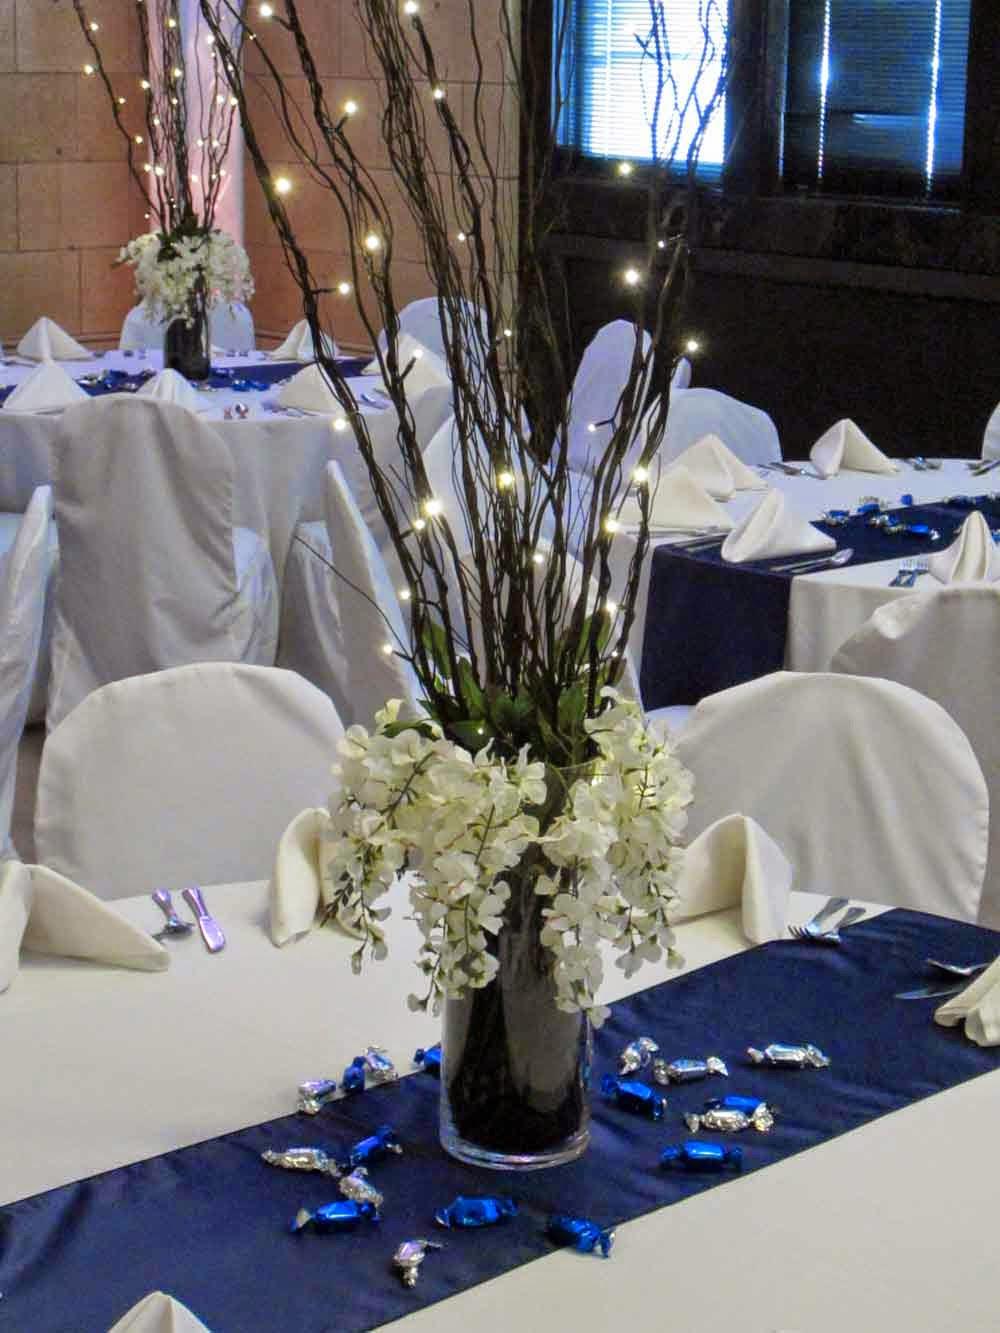 Best ideas about Wedding Centerpieces DIY . Save or Pin Planning Tip 15 DIY Wedding Centerpieces Now.